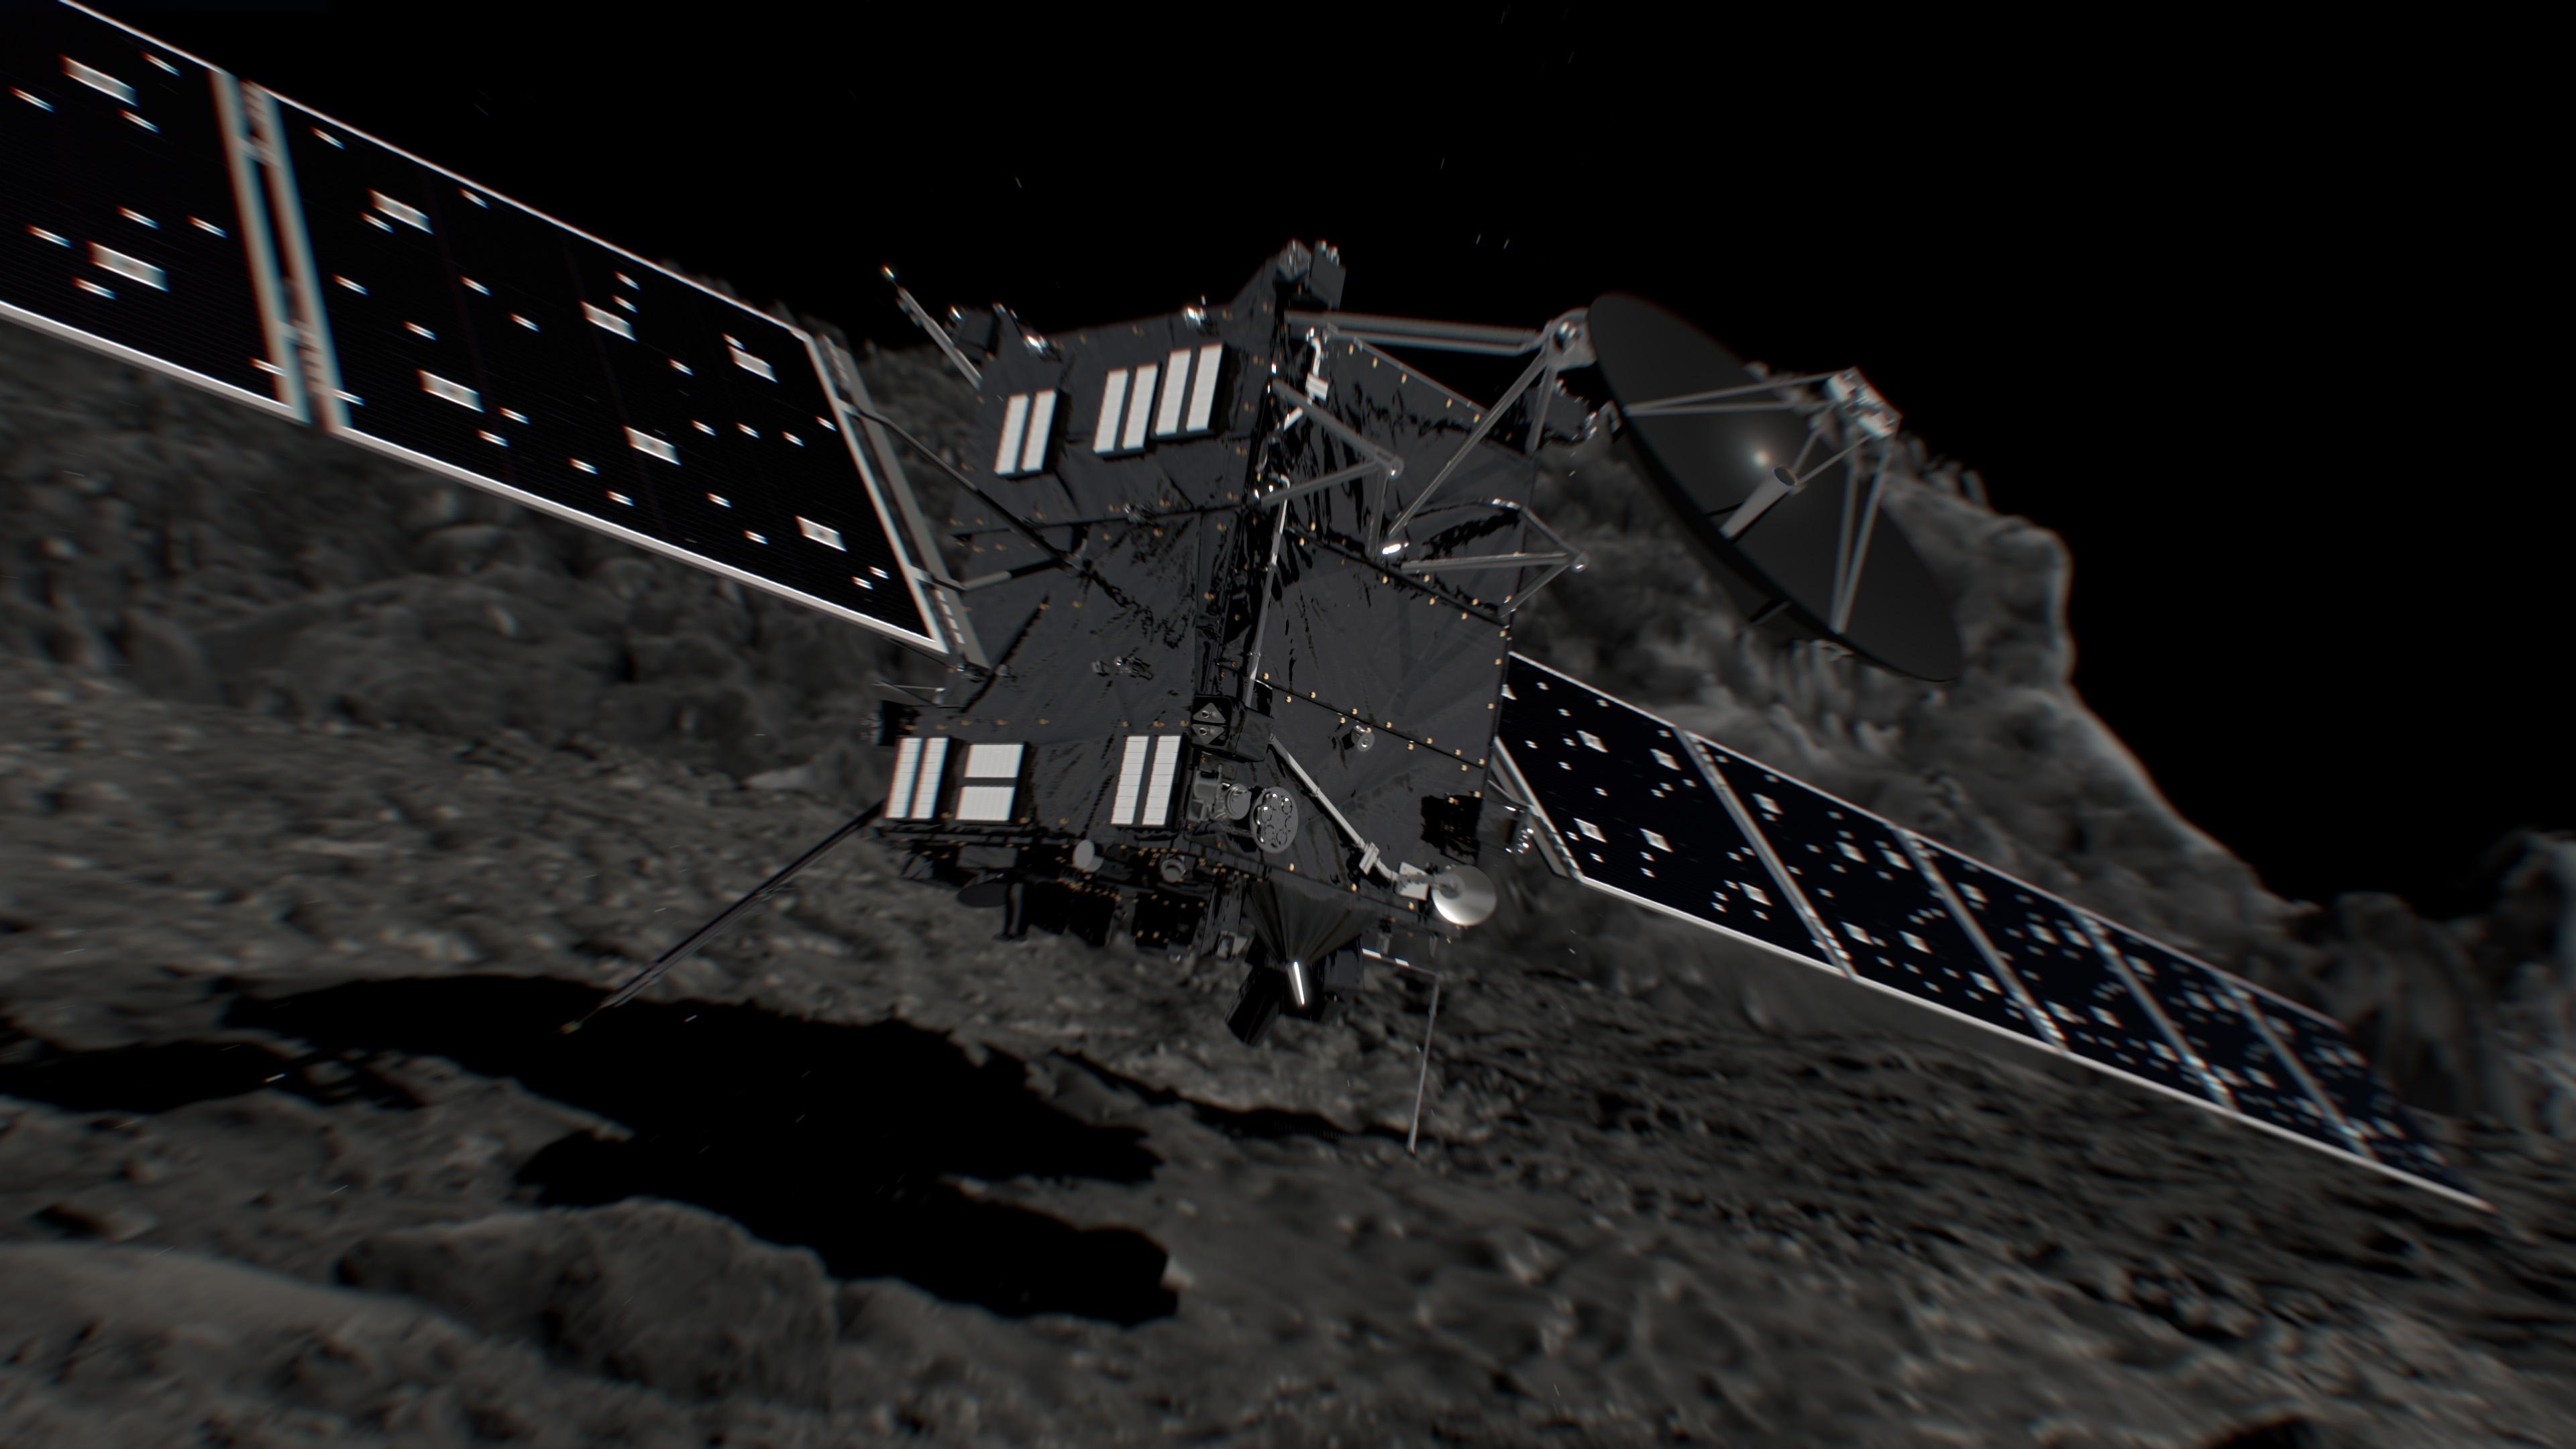 Goodbye, Rosetta! Spacecraft Crash-Lands on Comet in Epic Mission Finale